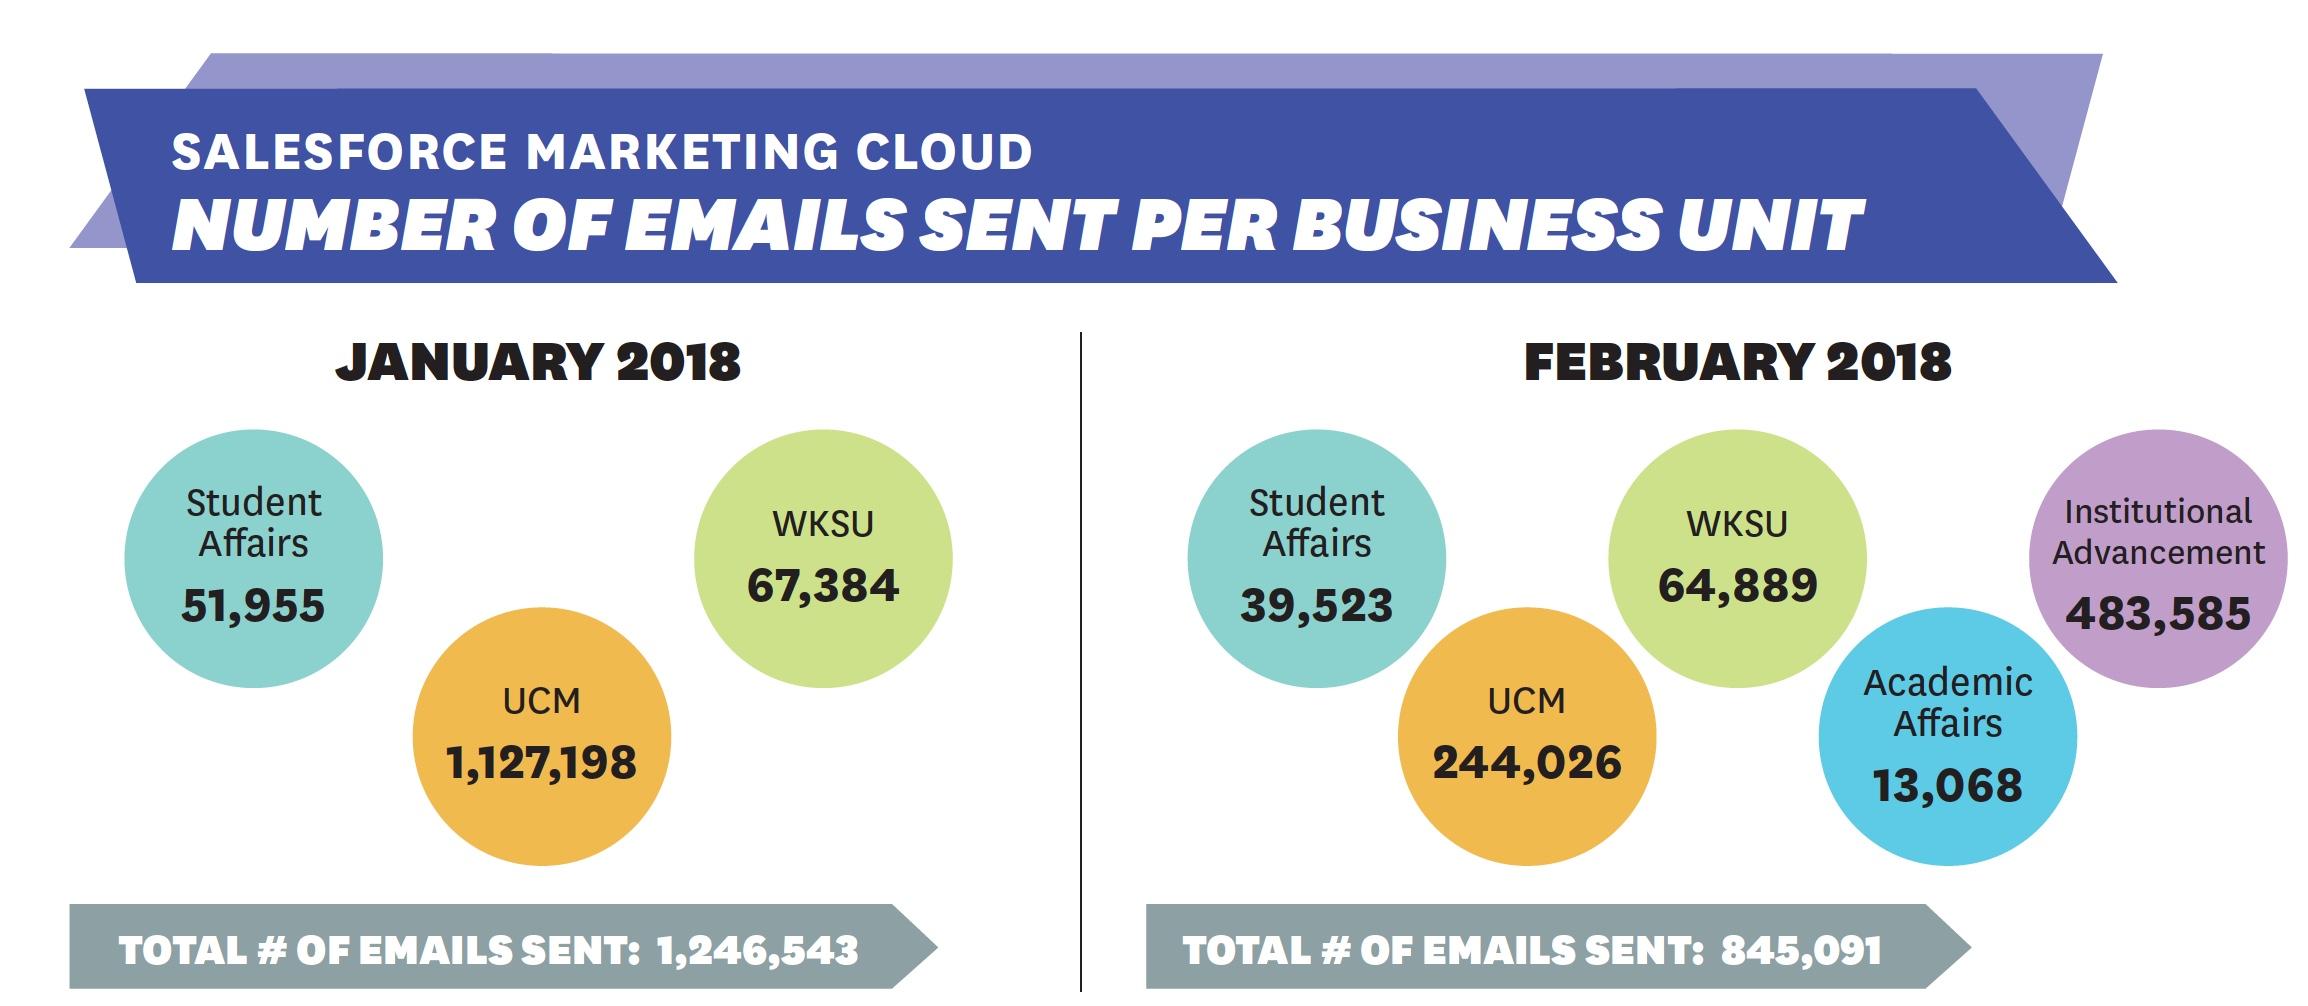 Mar/Apr 2018 Marketing Cloud Statistics Infographic